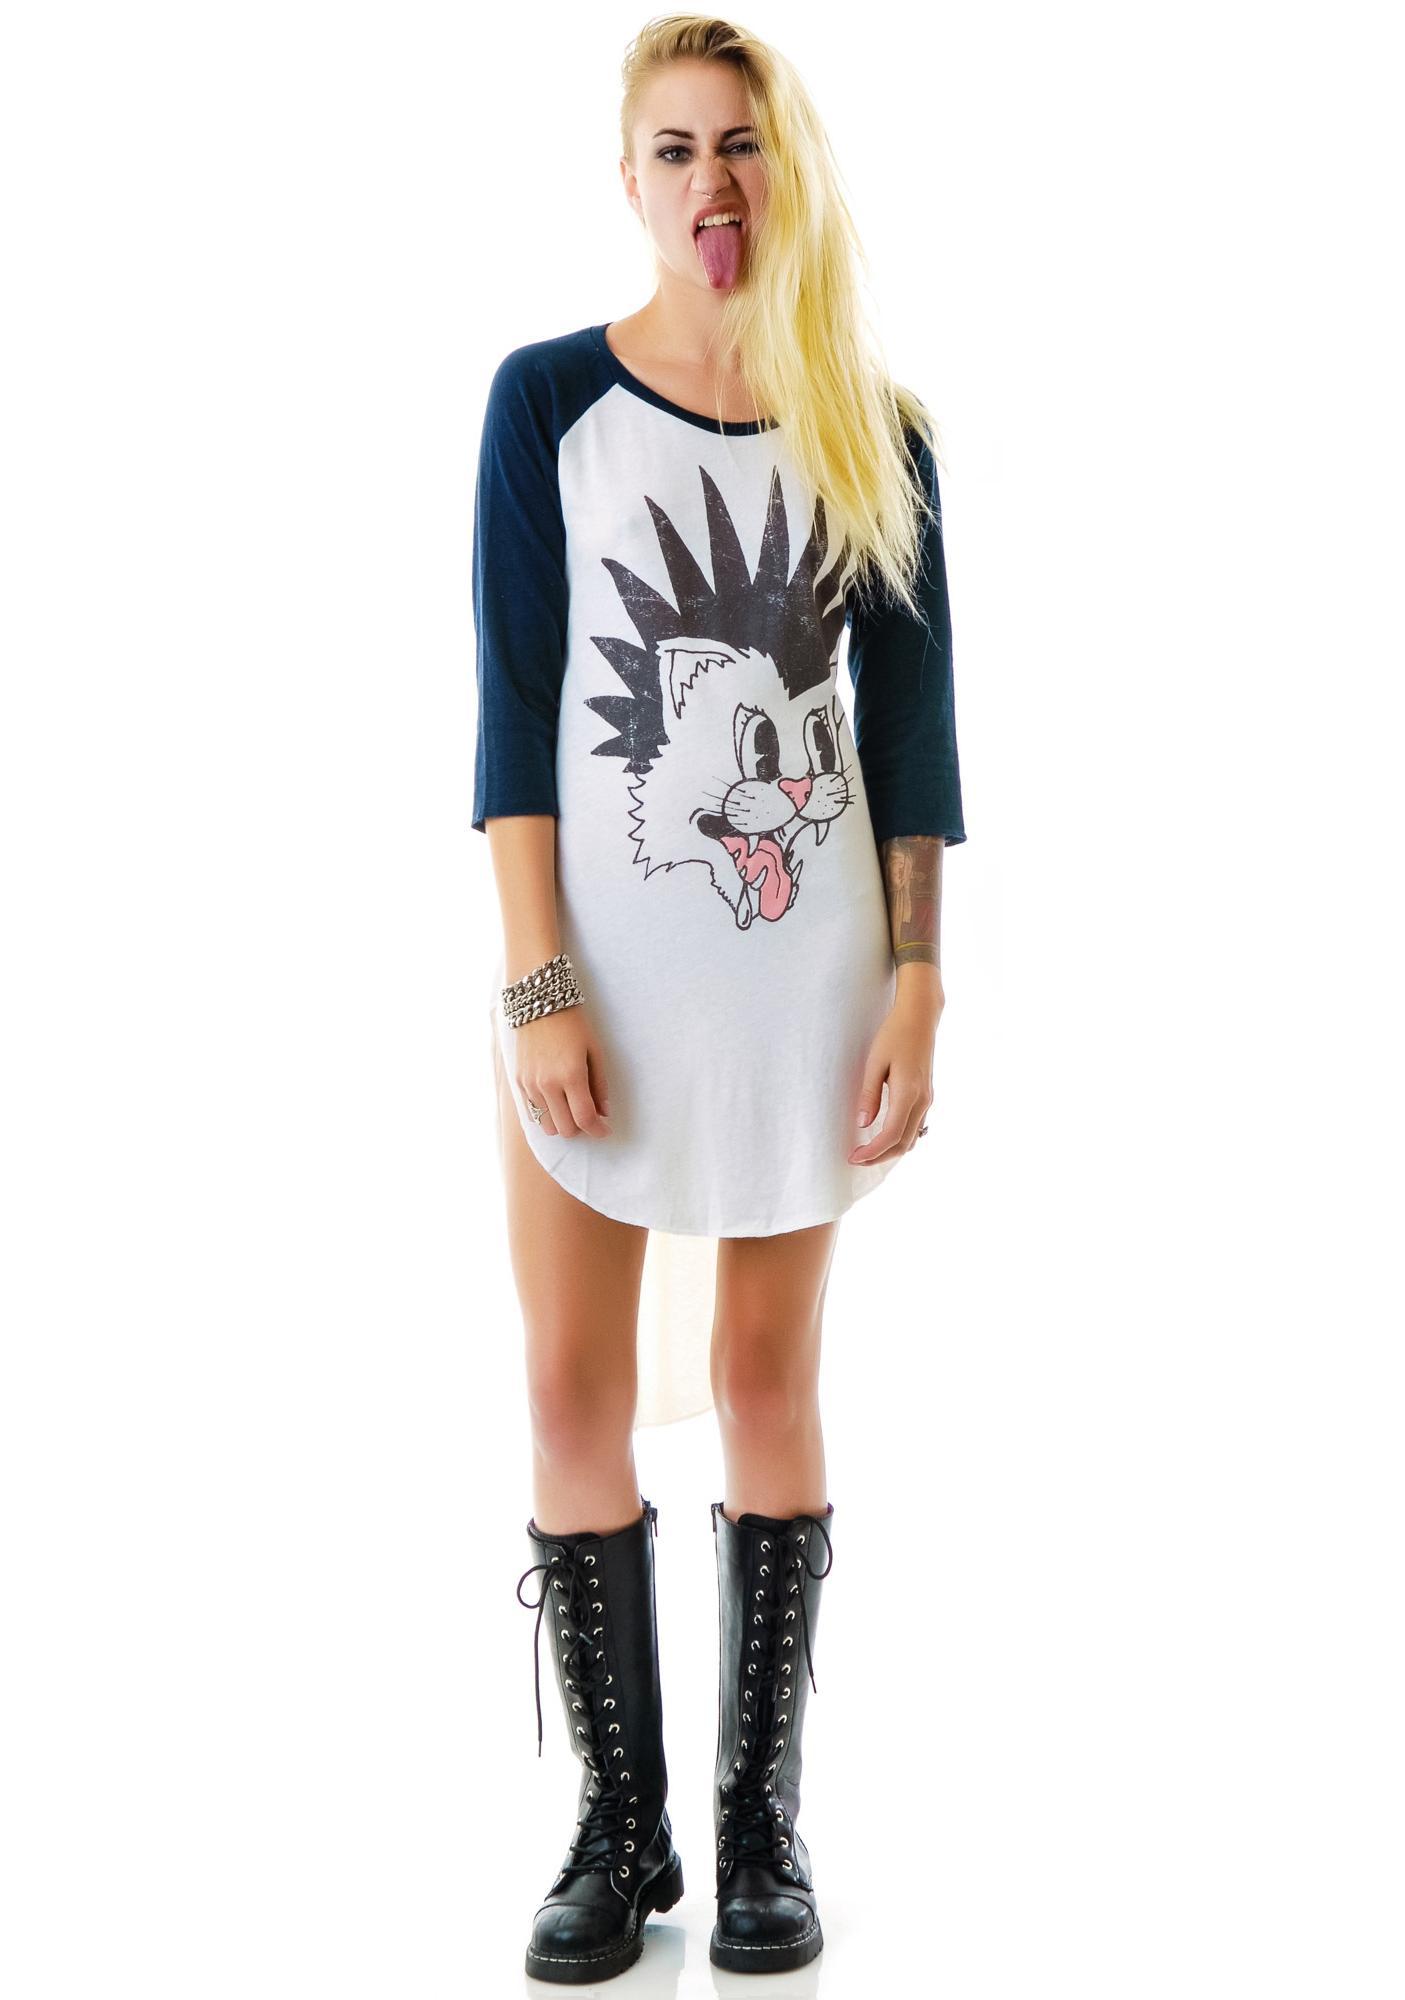 Stray Cats Raglan Dress